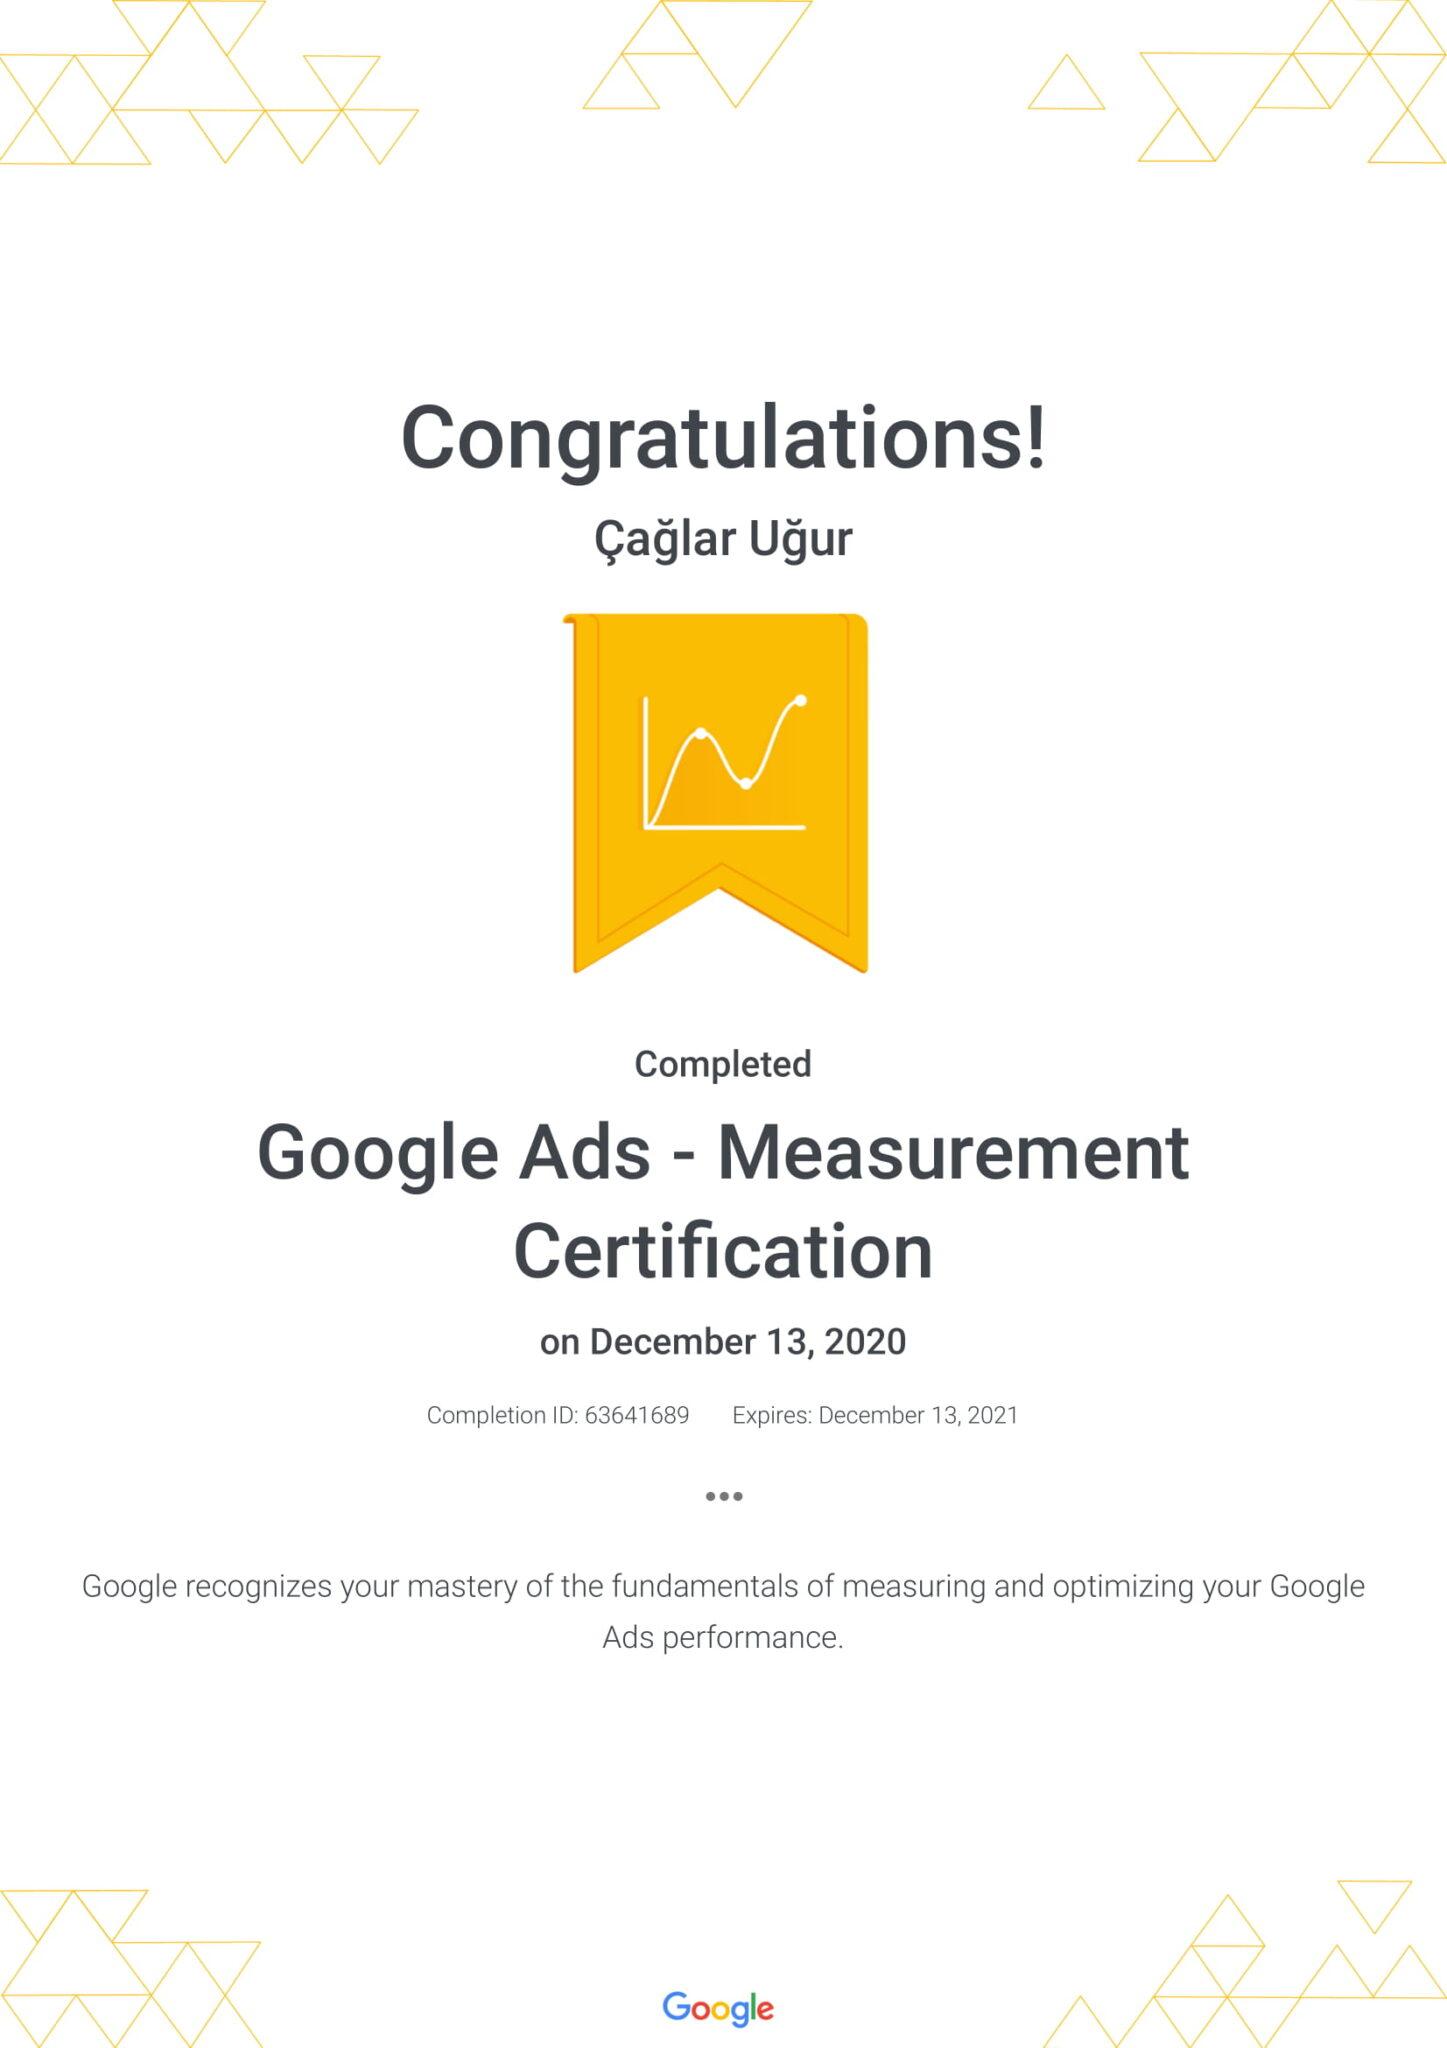 Google Ads - Measurement Certification